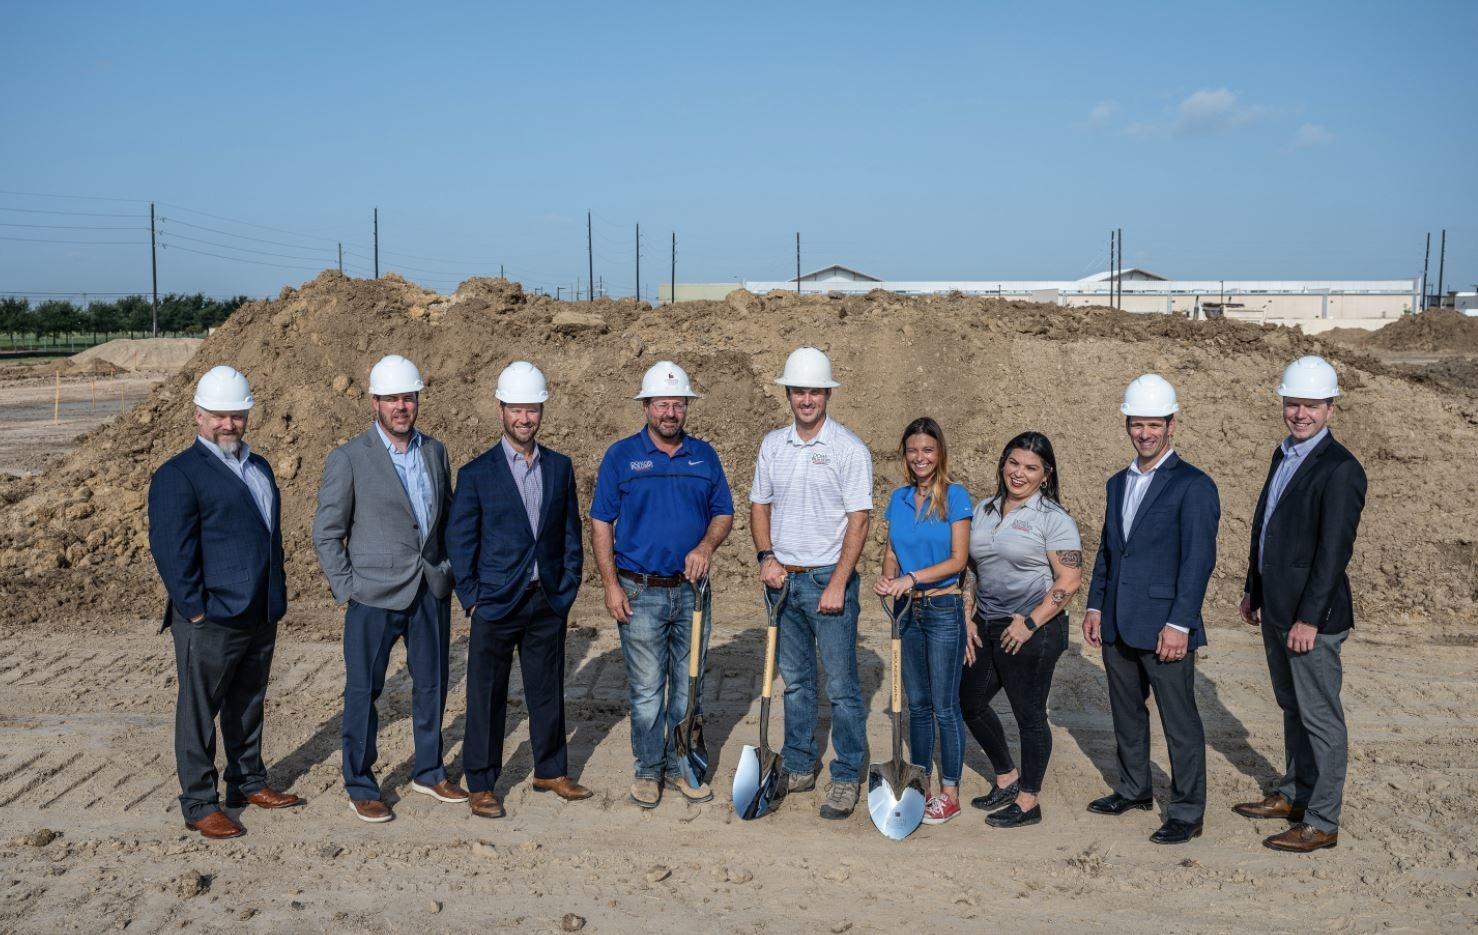 Venterra Realty Breaks Ground on 336-Unit Luxury Apartment Community Development in Houston Submarket of Cypress, Texas